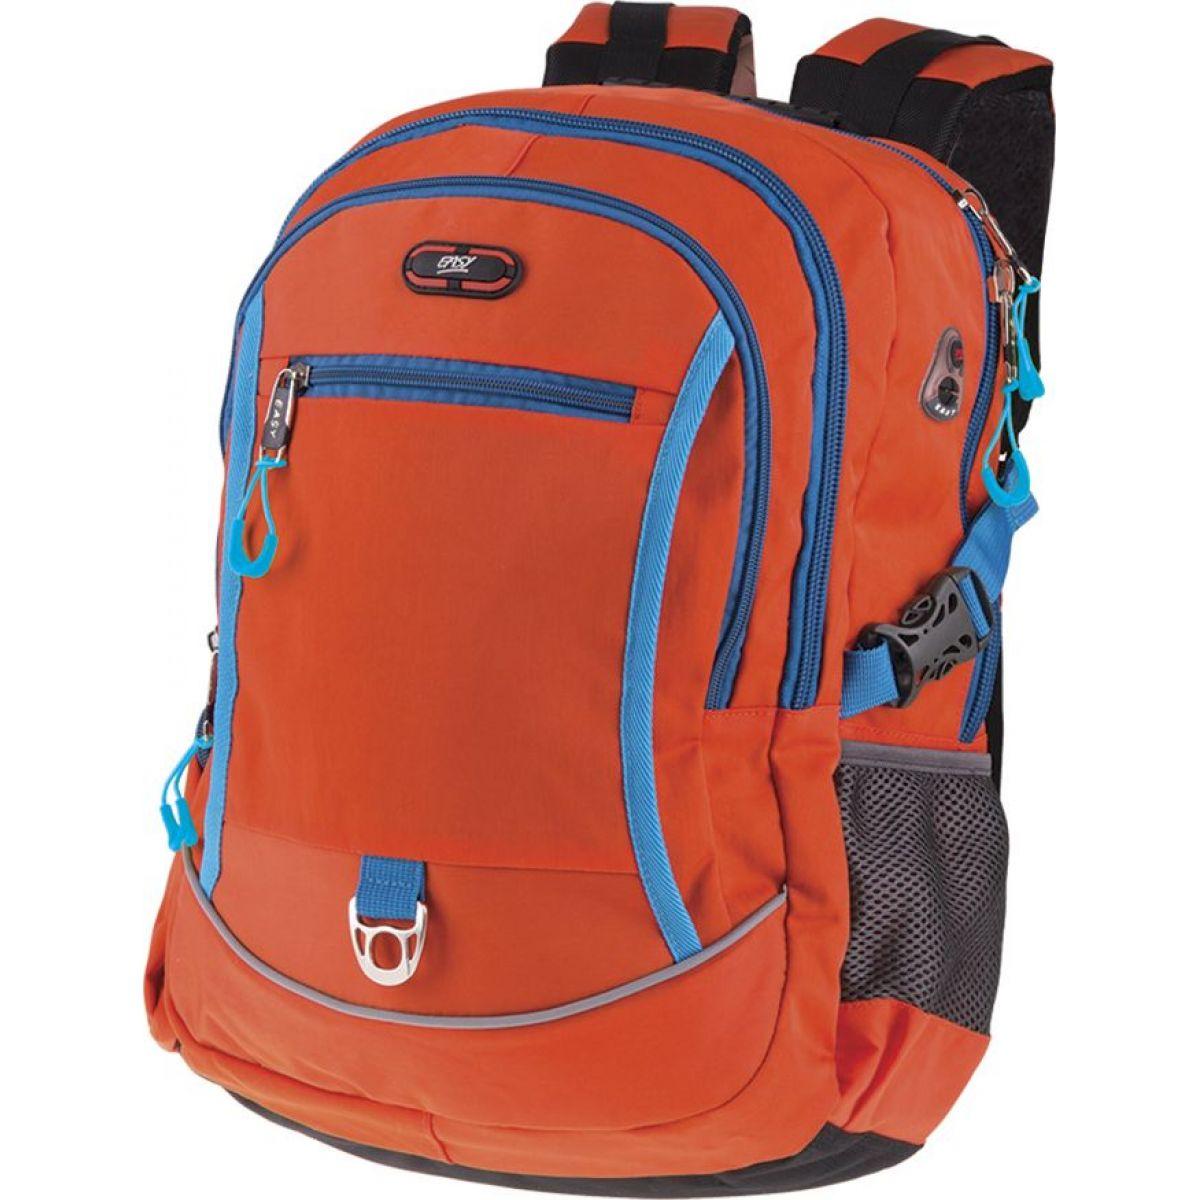 Easyoffice Batoh školský športový Oranžový s modrým lemom